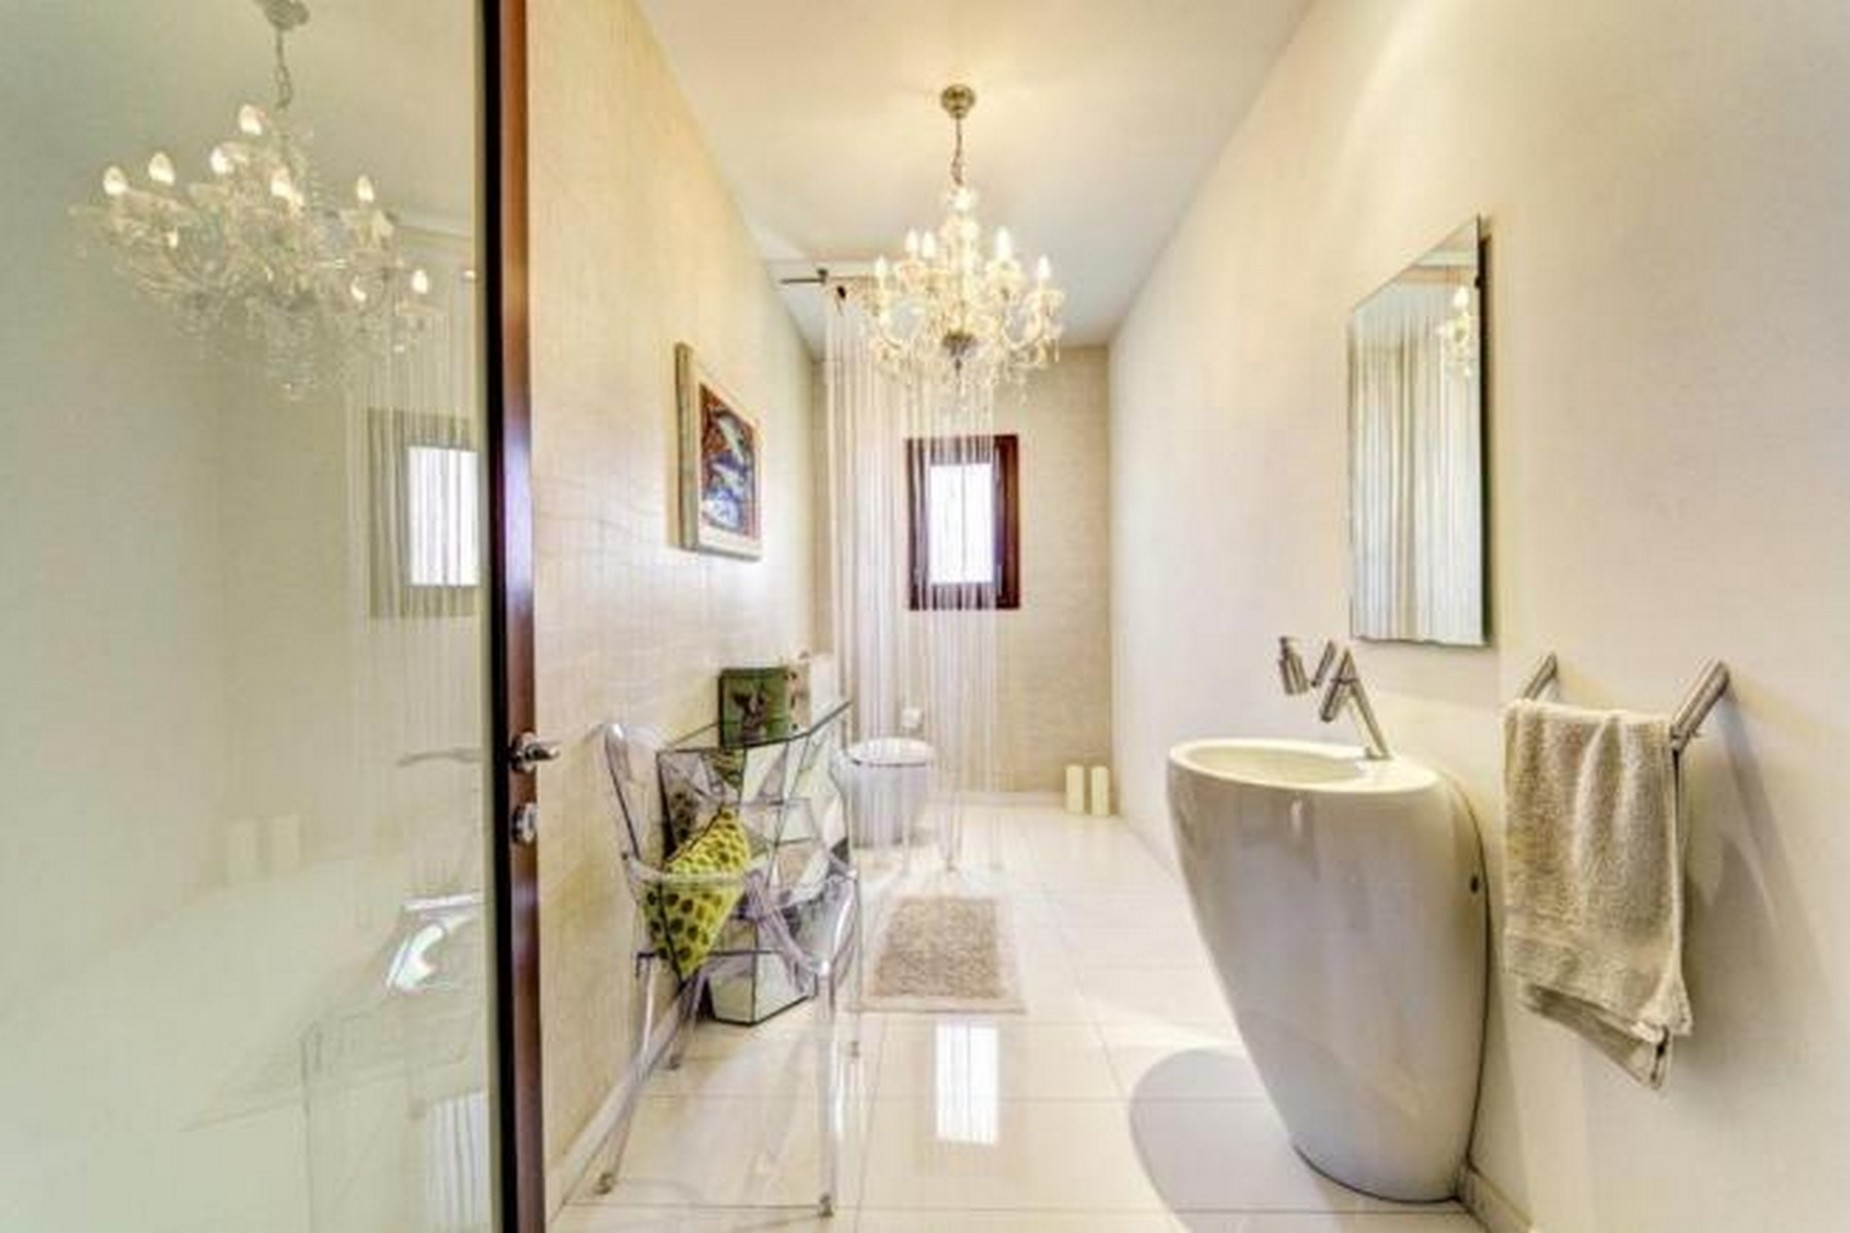 4 bed Villa For Rent in Marsascala, Marsascala - thumb 13